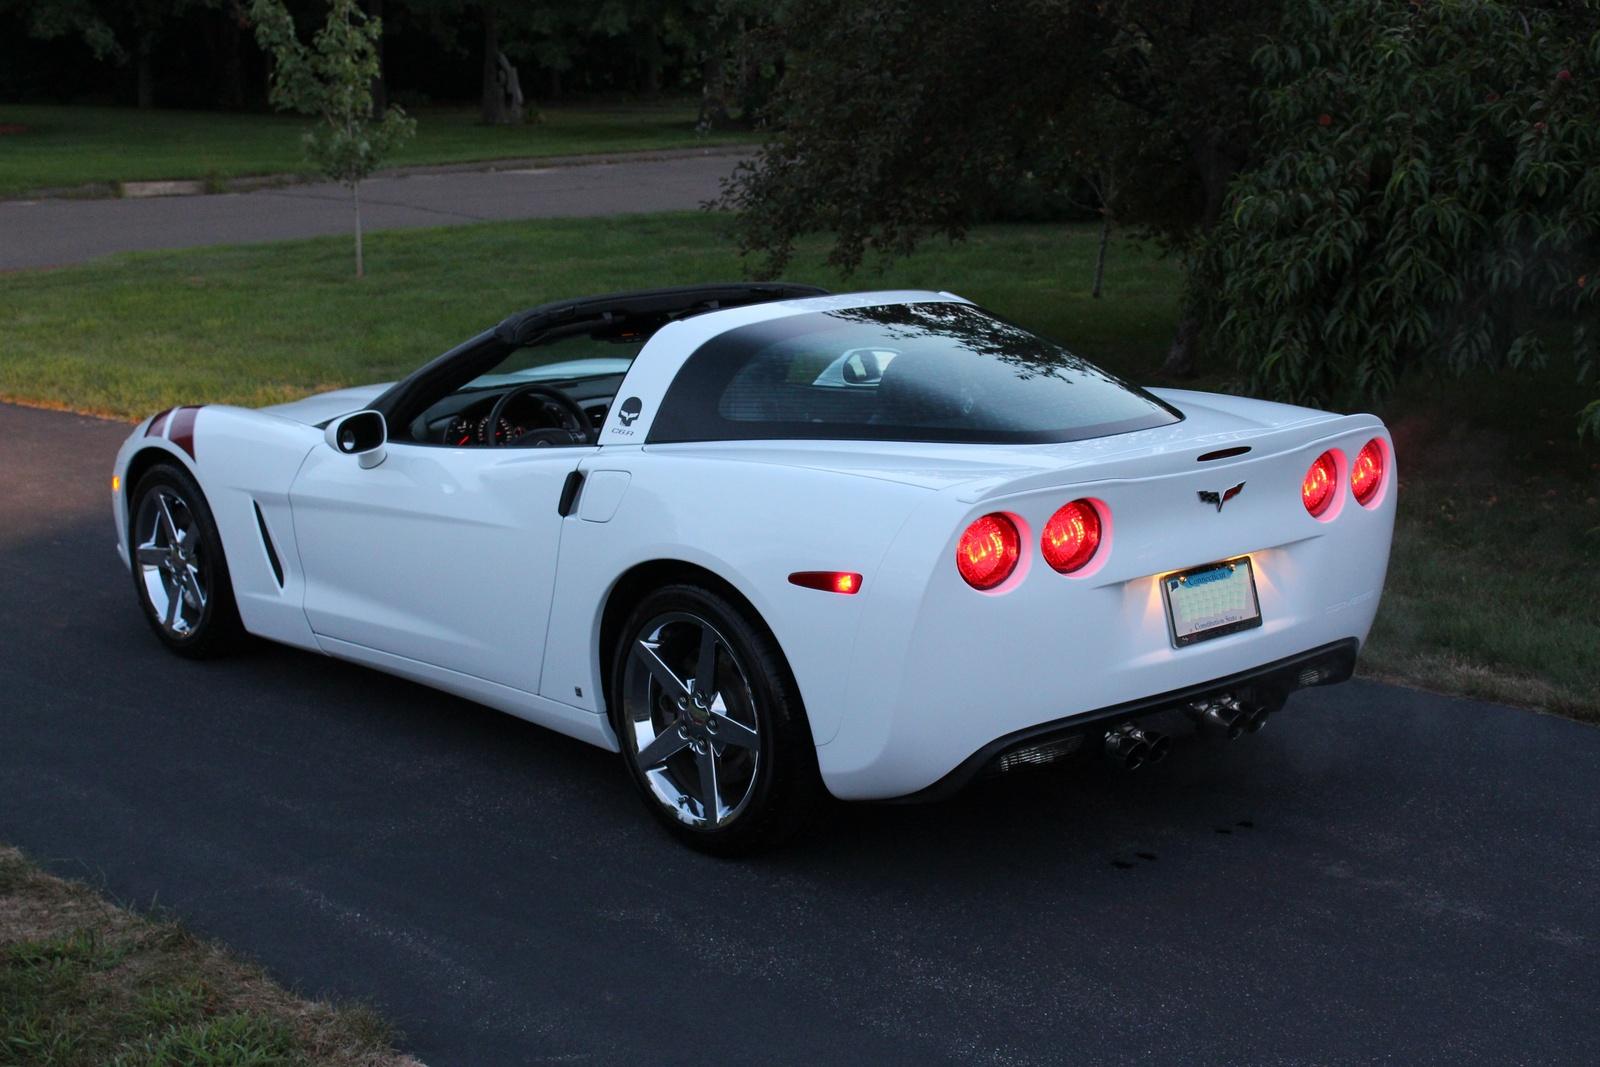 2007 chevrolet corvette z06 price specs more tattoo design bild. Black Bedroom Furniture Sets. Home Design Ideas